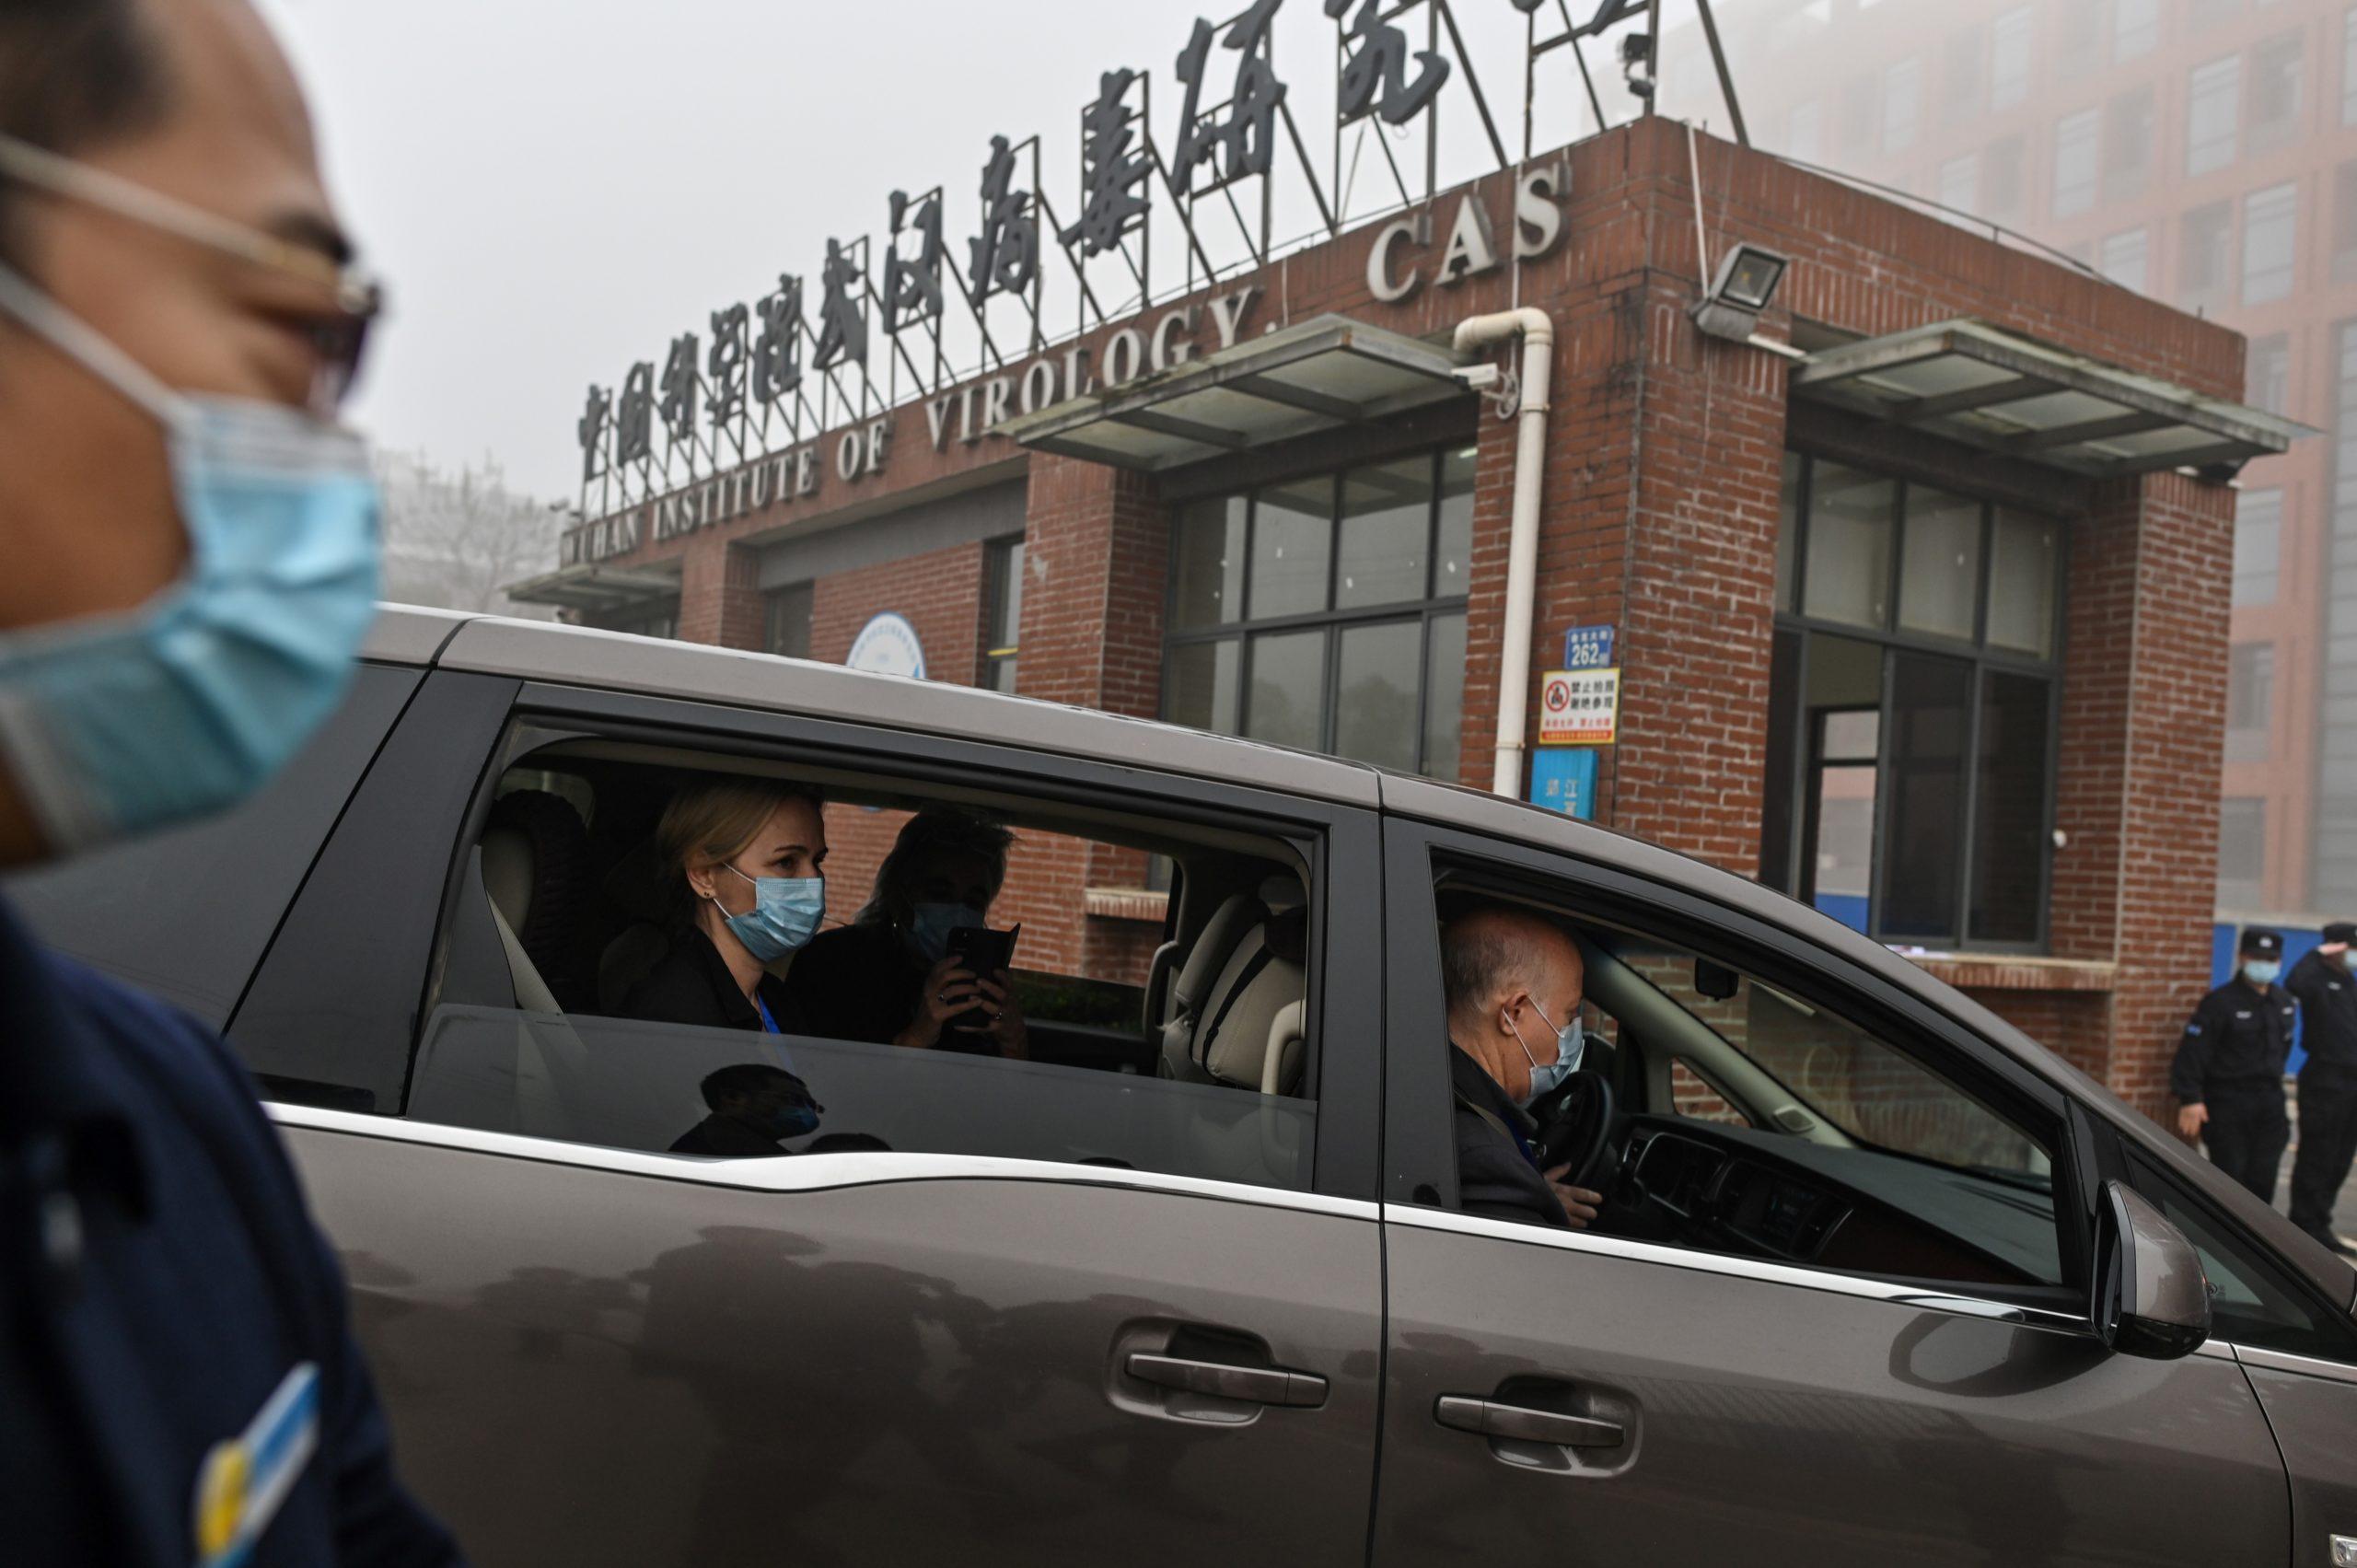 Members of the World Health Organization arrive at the Wuhan Institute of Virology in on Feb. 3. (Hector Retamal/AFP via Getty Images)